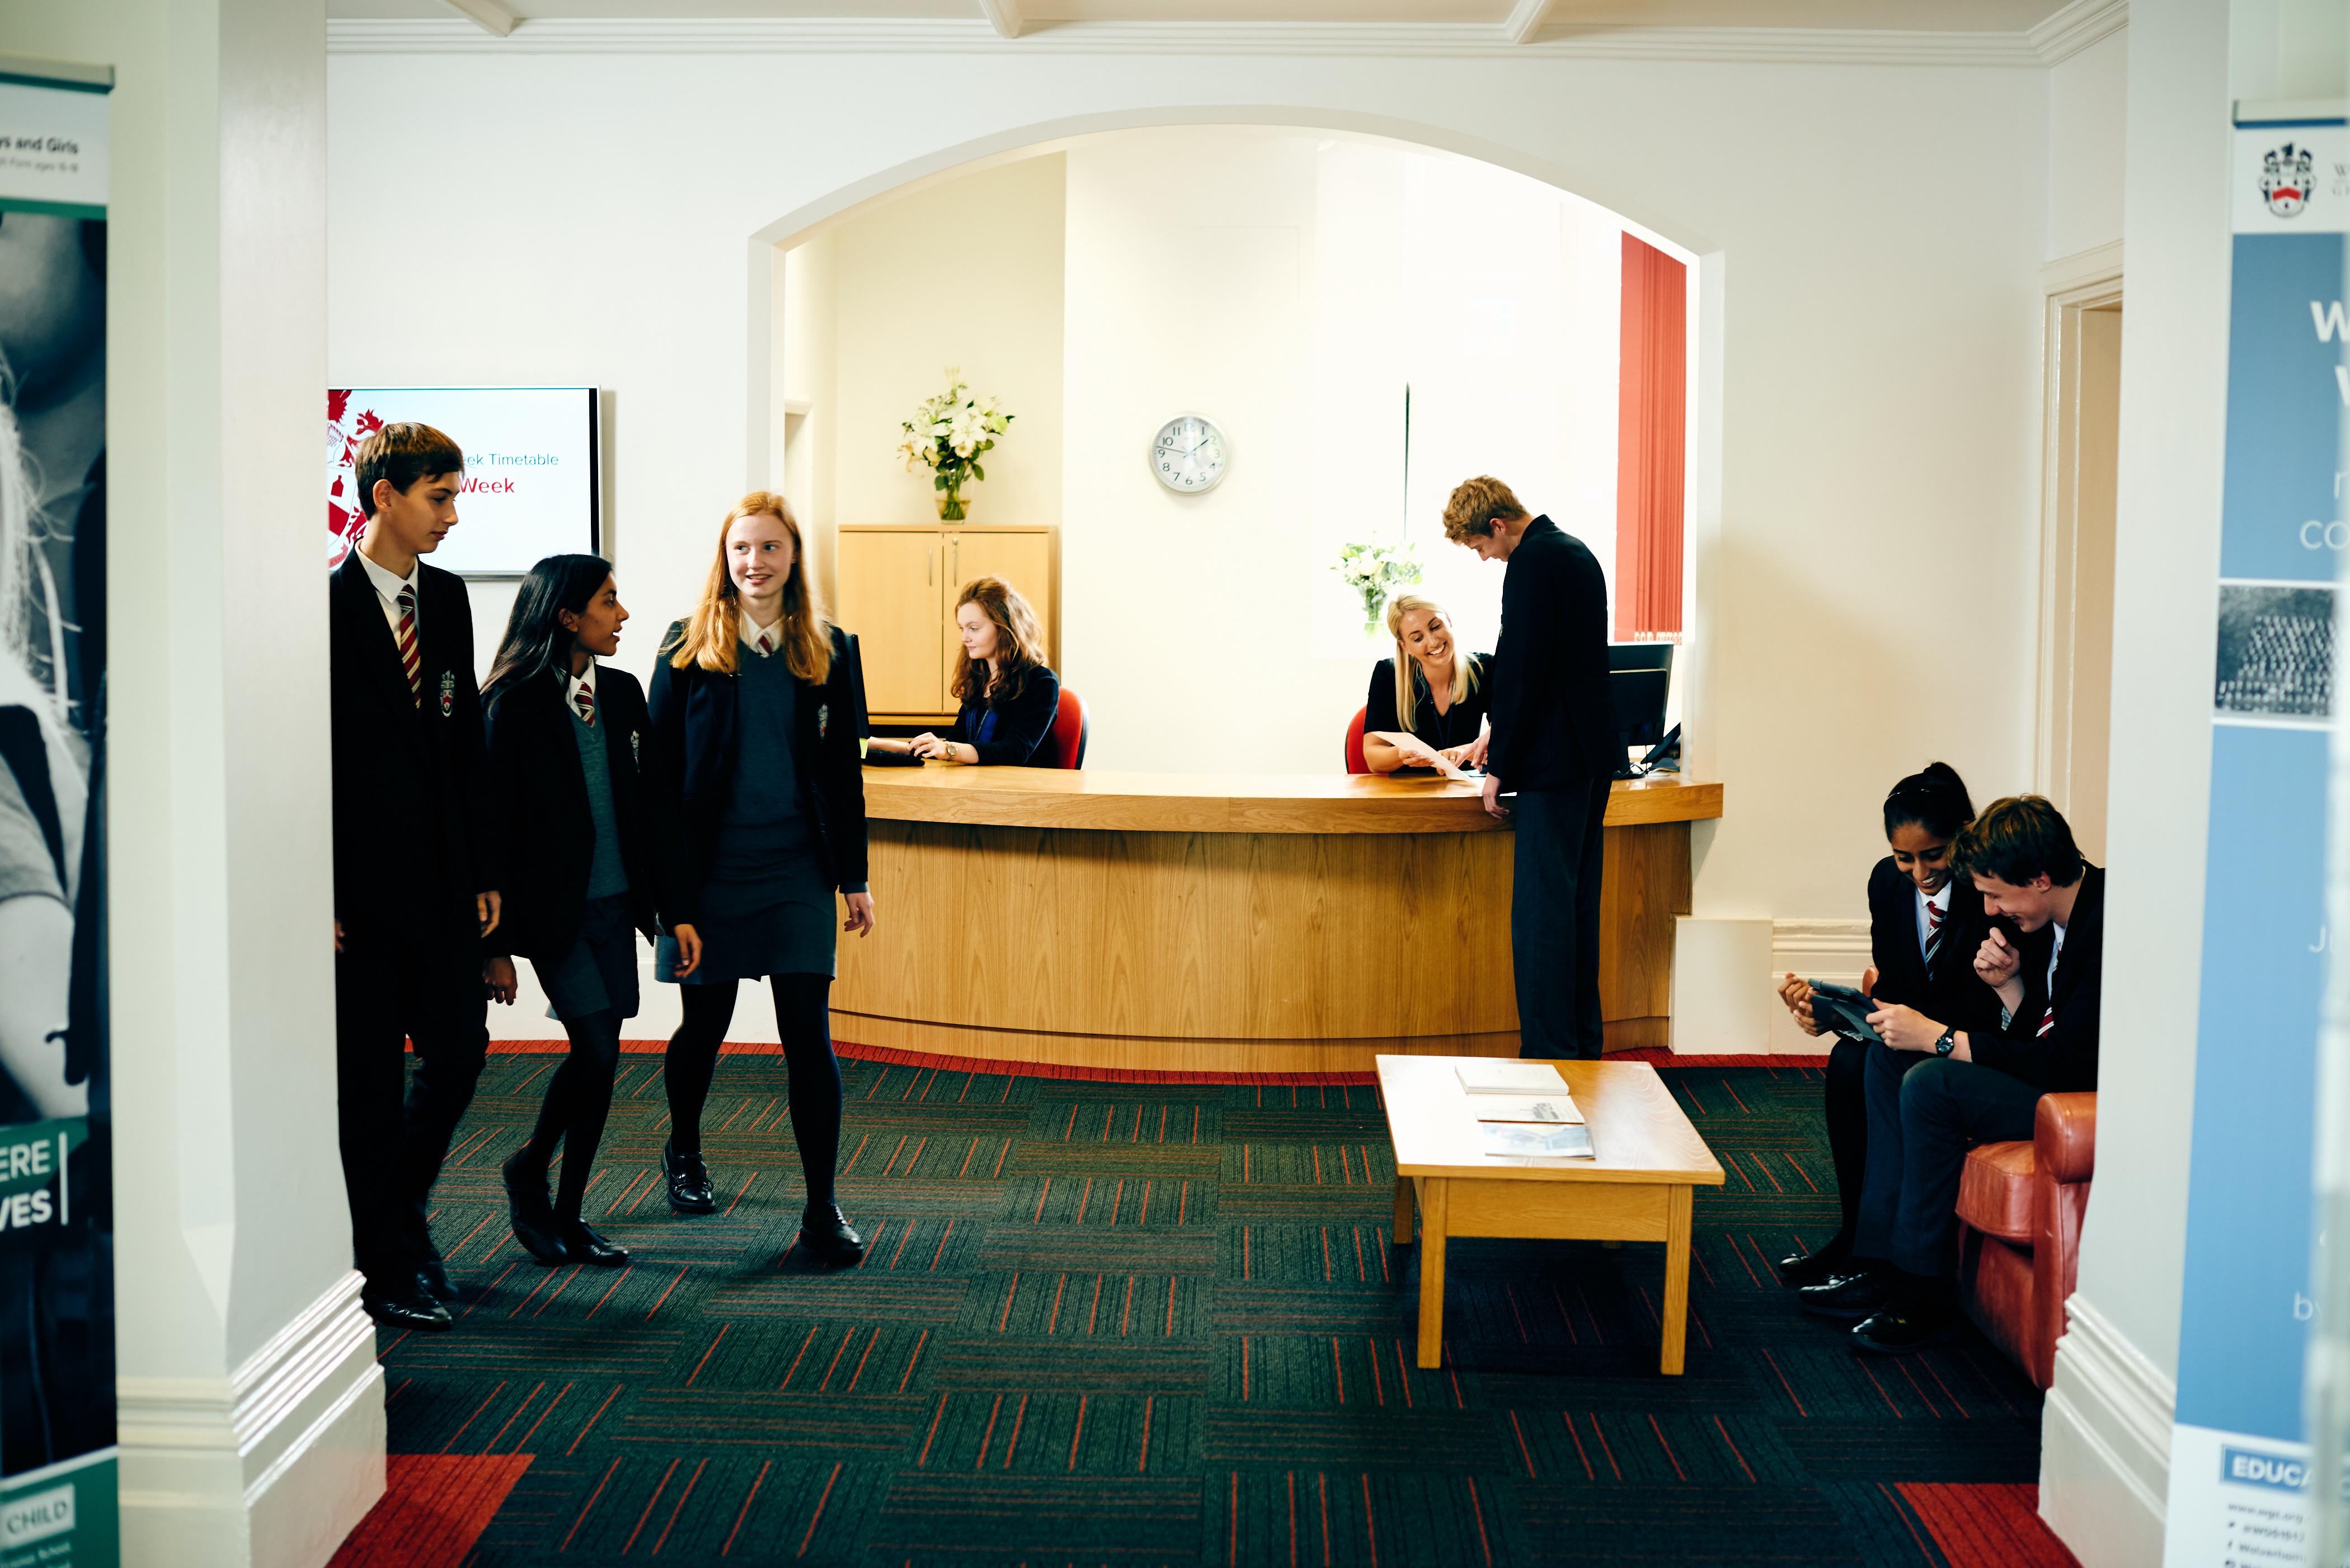 employer gallery photo 21